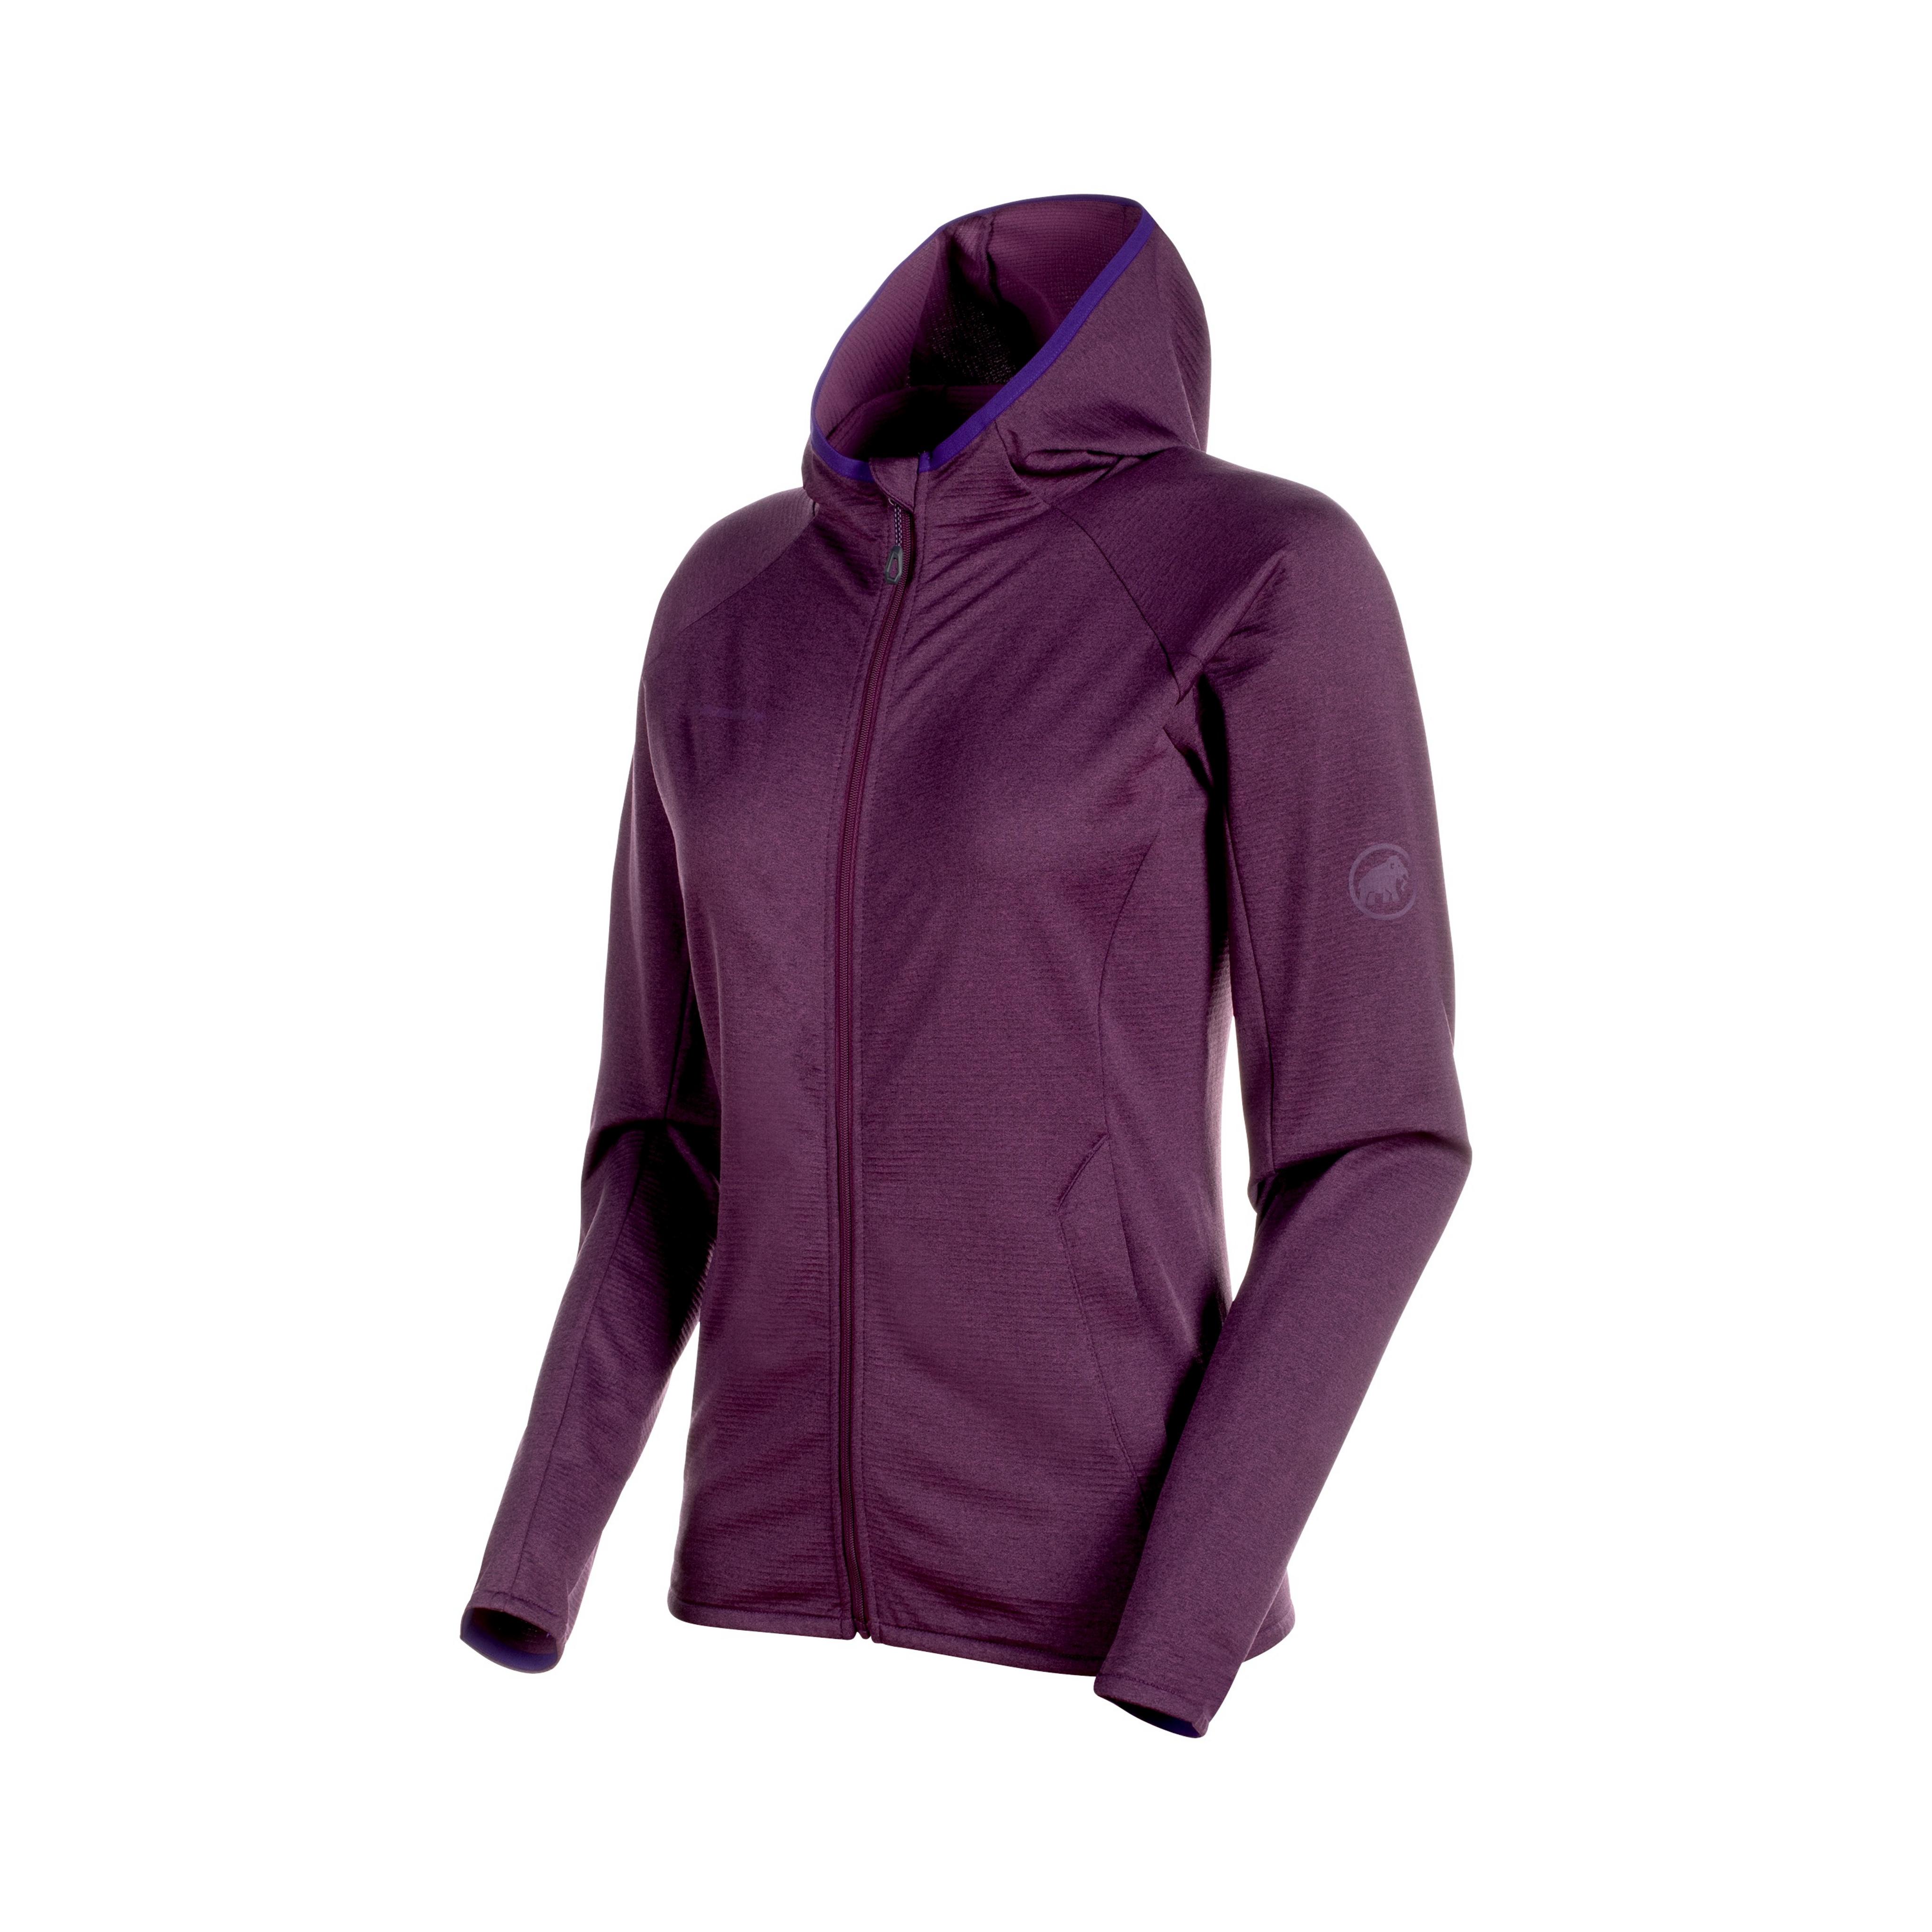 Nair ML Hooded Jacket Women - galaxy melange, L product image